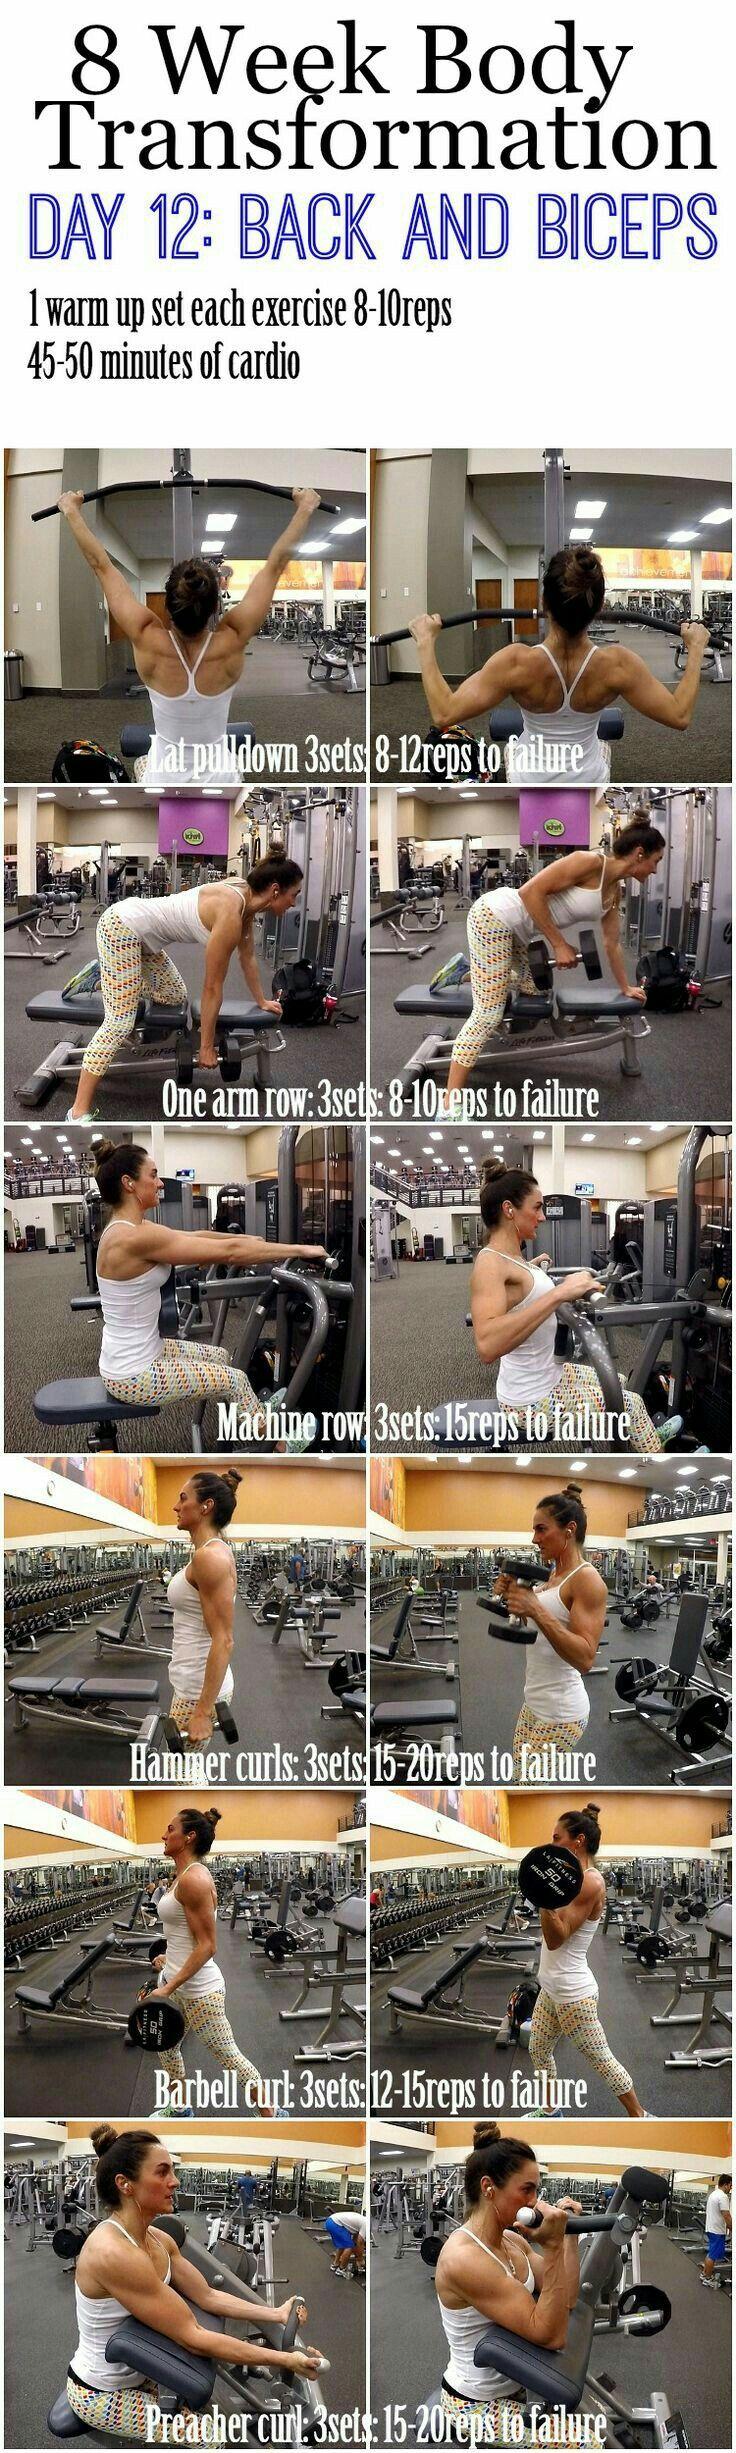 Back & biceps (Thursday workout idea)